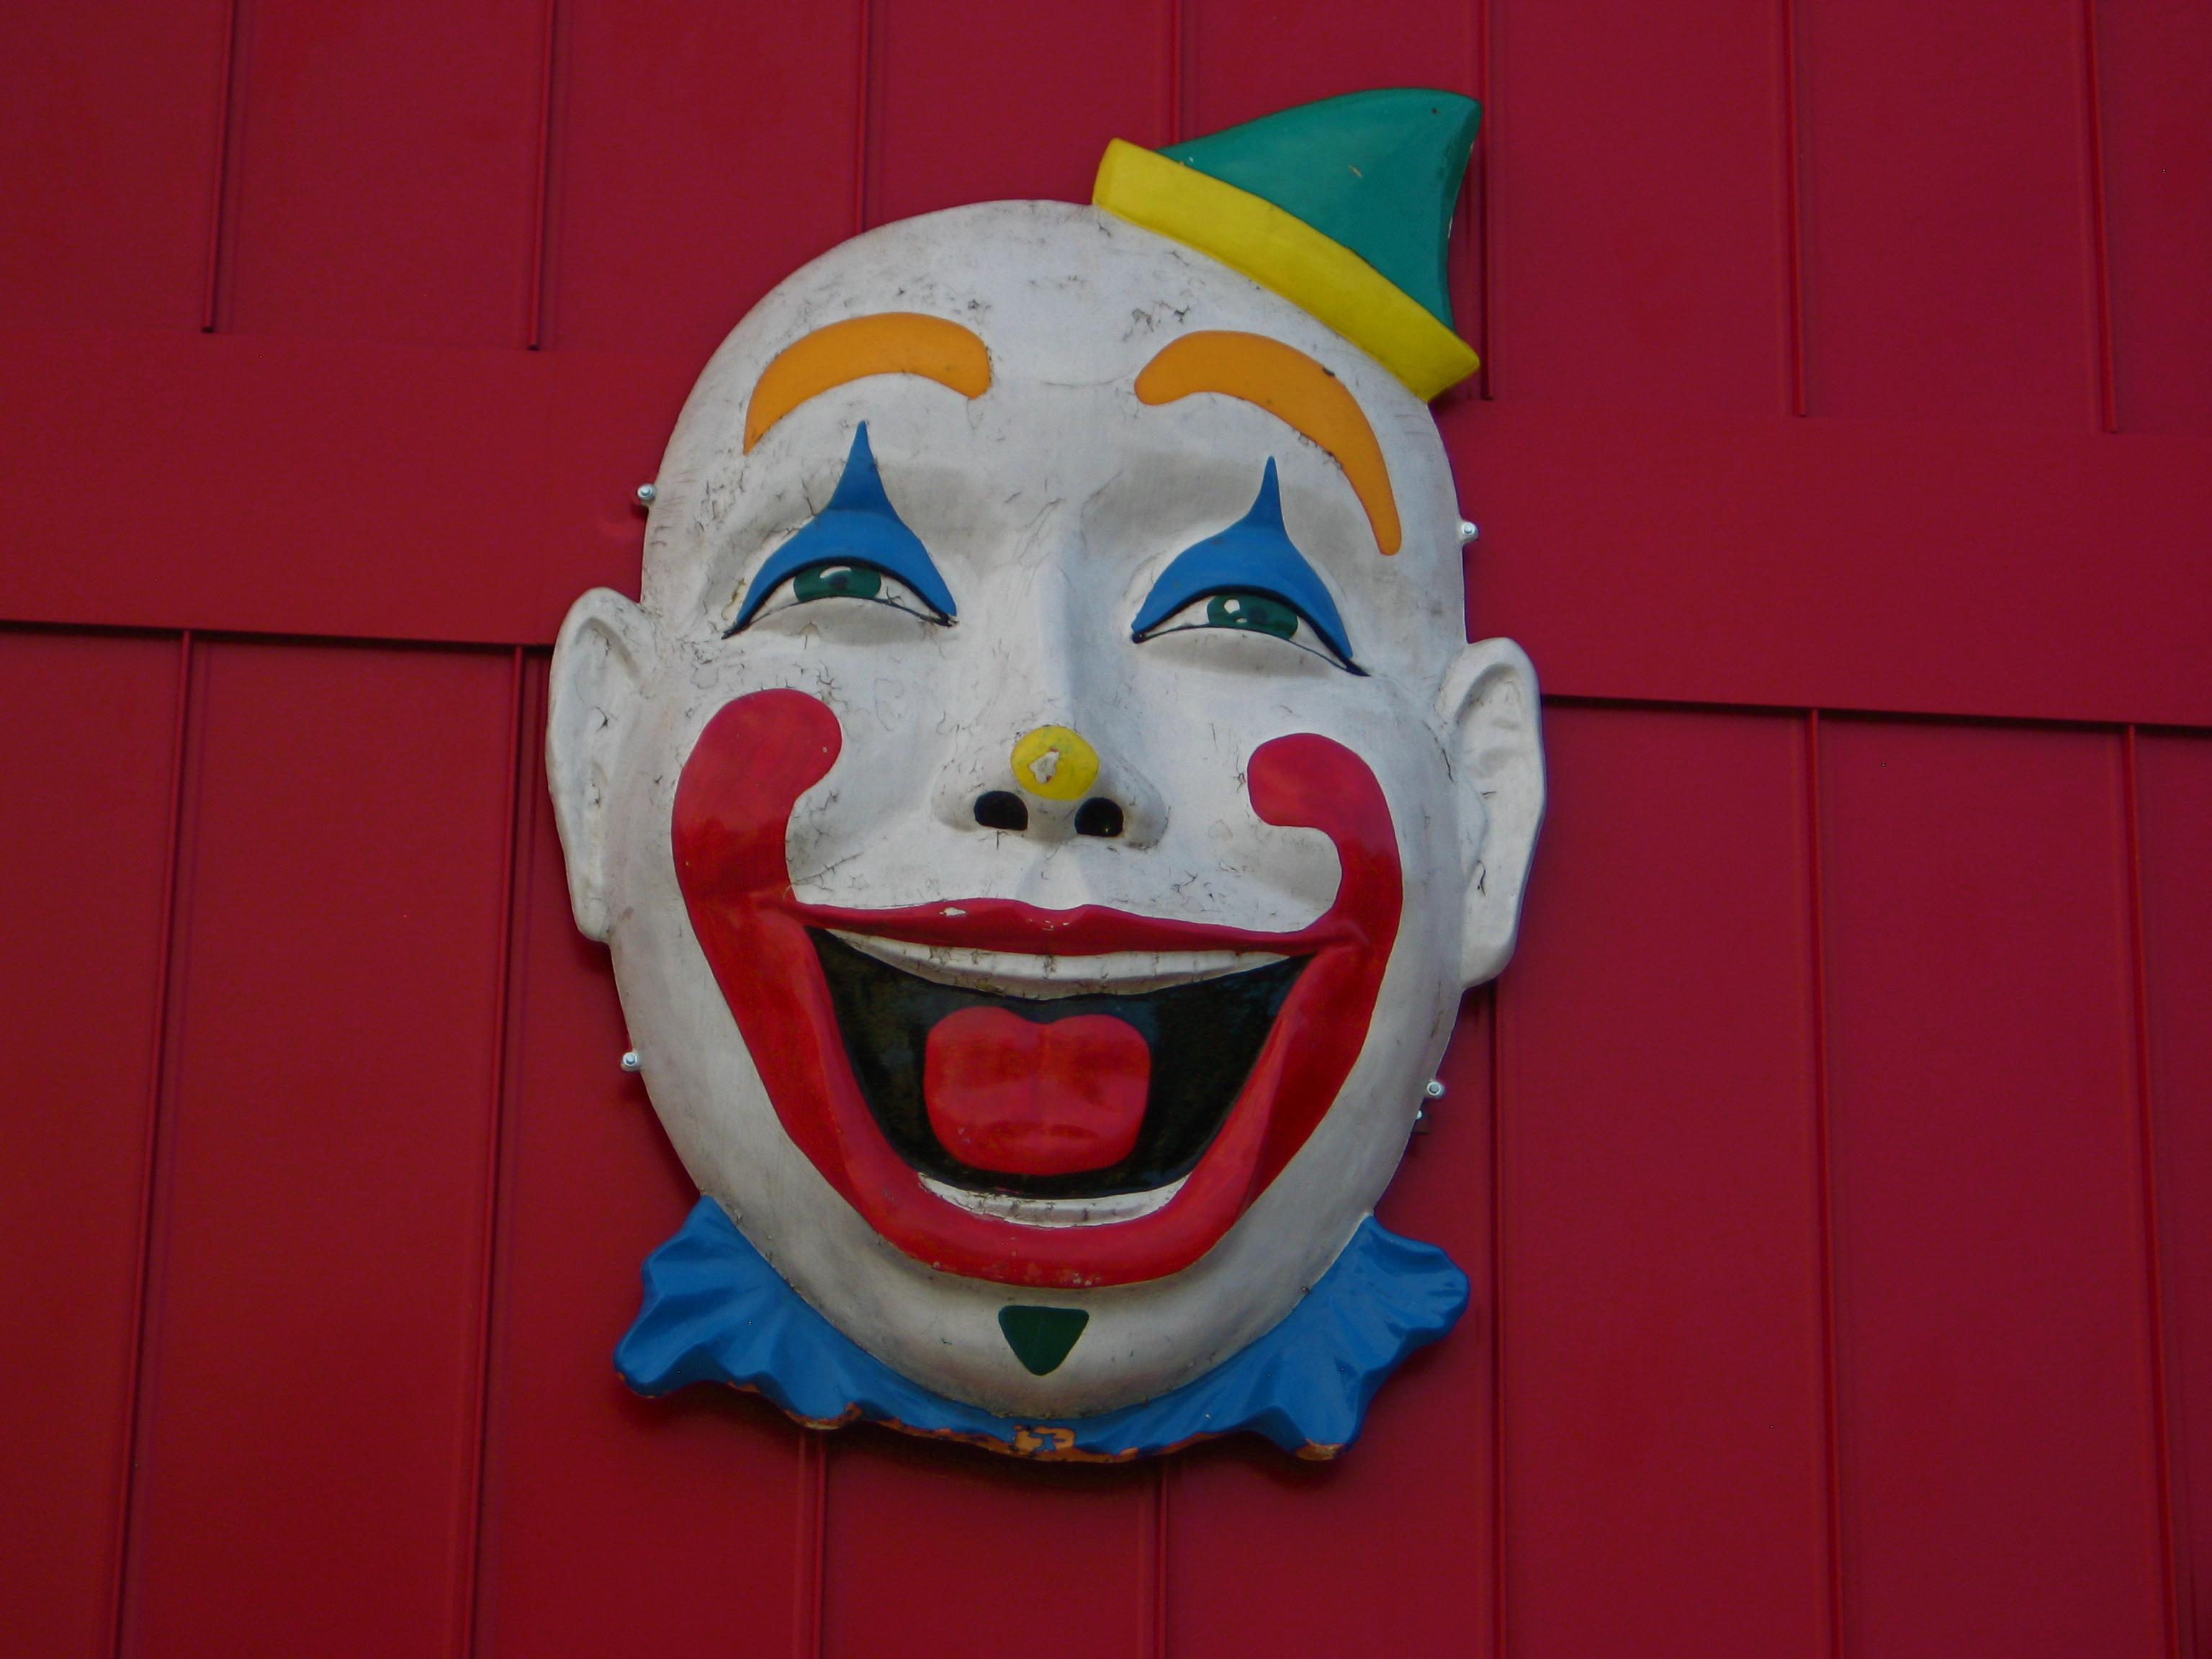 Kitsch Fix 7 Clown Capped Garages Cot Writes